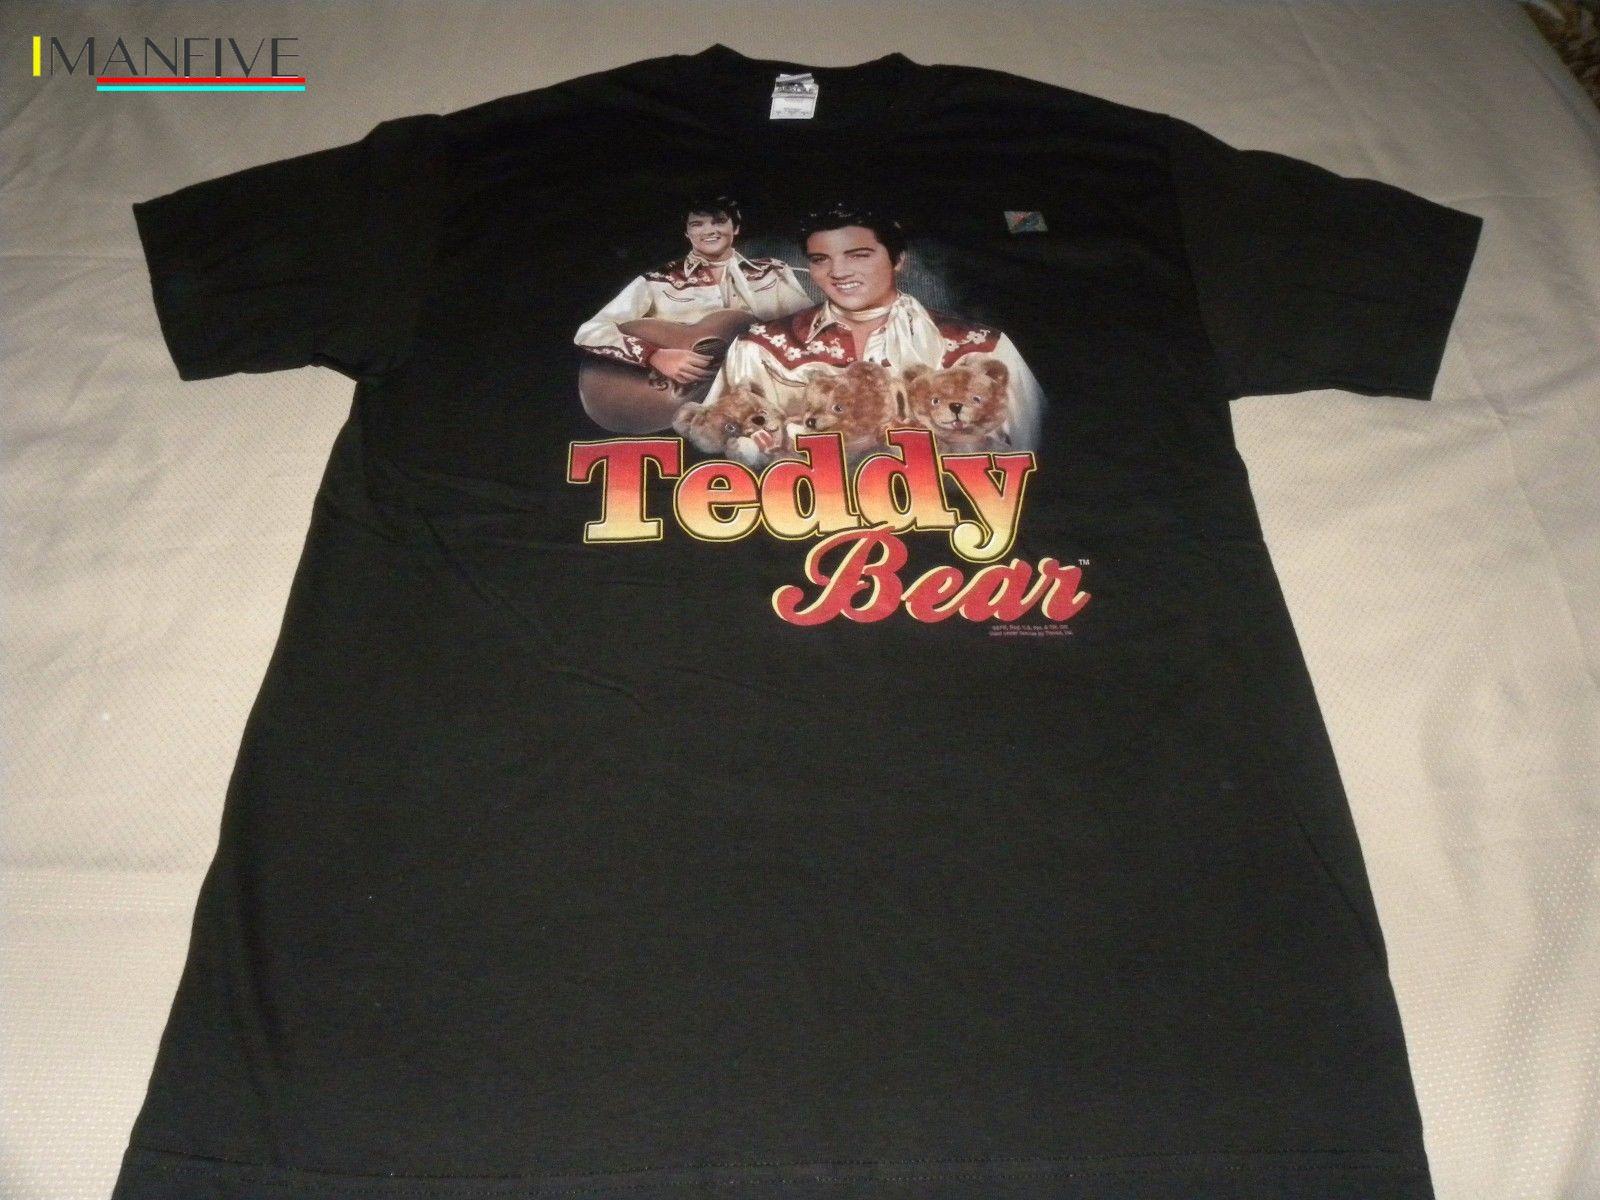 Elvis Presley Teddy Bear Graphic Black TShirt Size L Streetwear harajuku Print Cotton funny t shirts men in T Shirts from Men 39 s Clothing